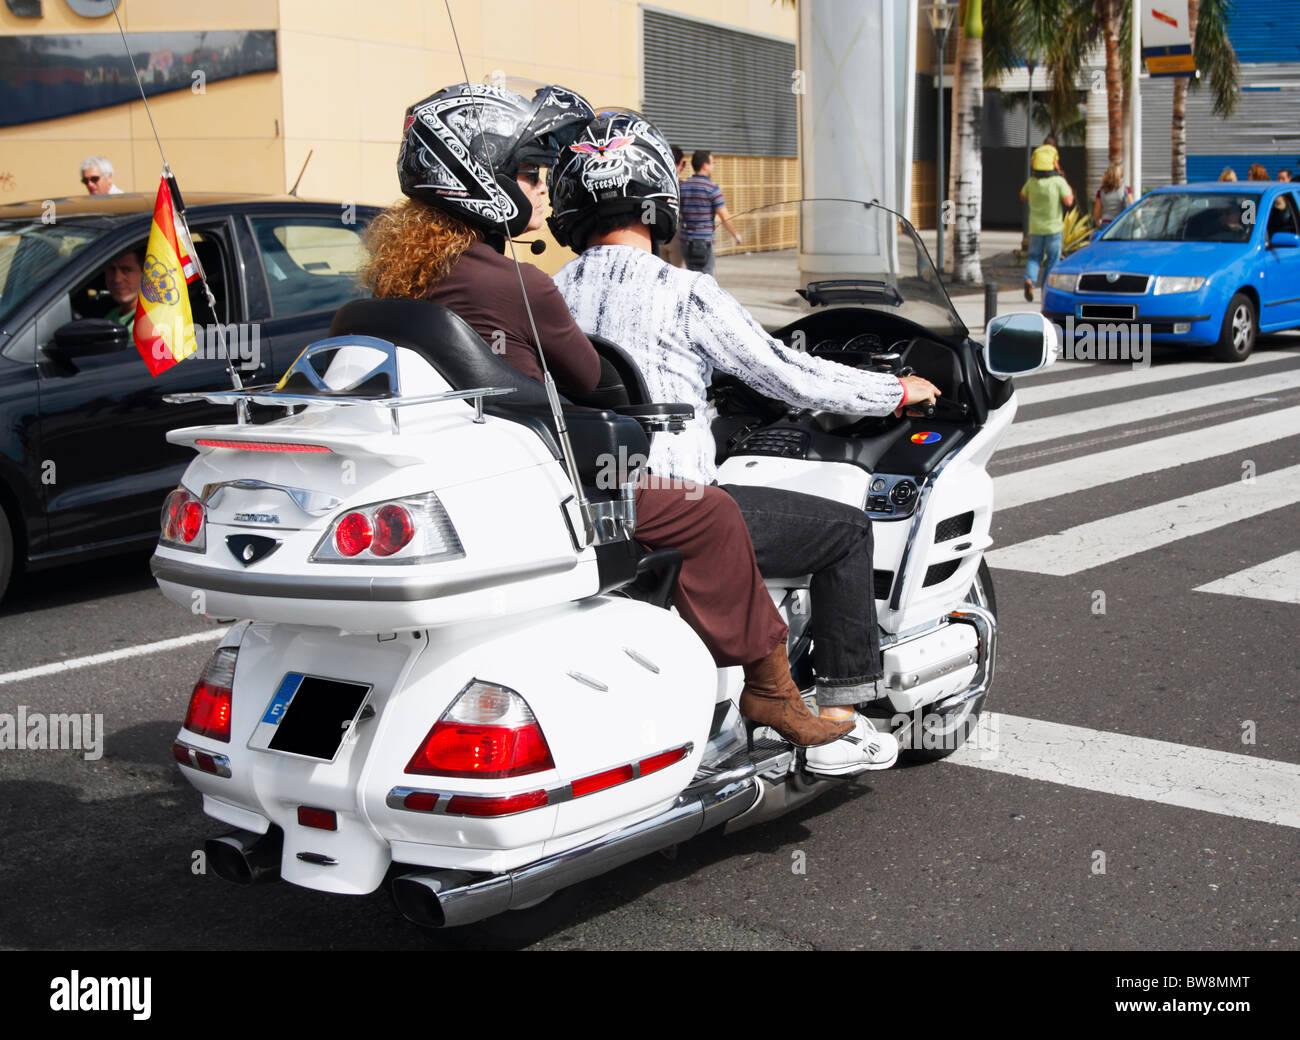 American Honda Motorcycle Service Center Instructor